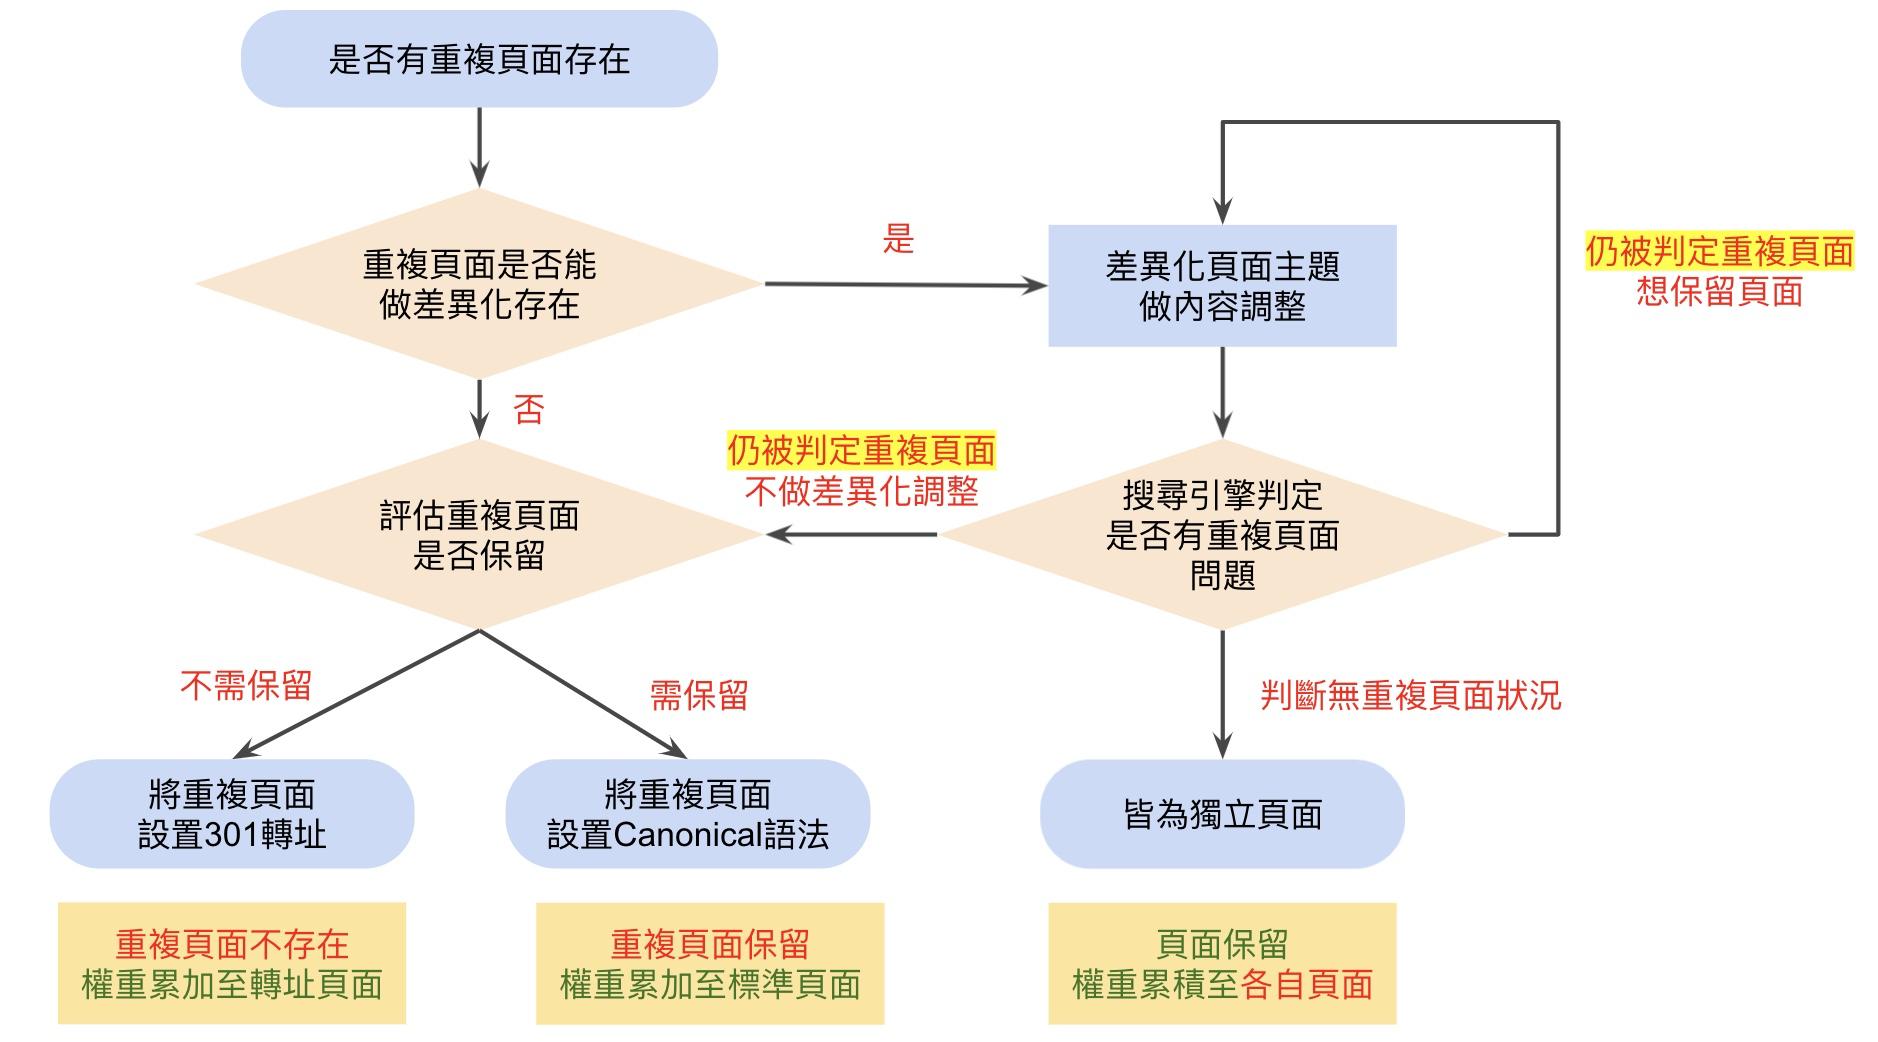 Canonical前期評估參考流程圖